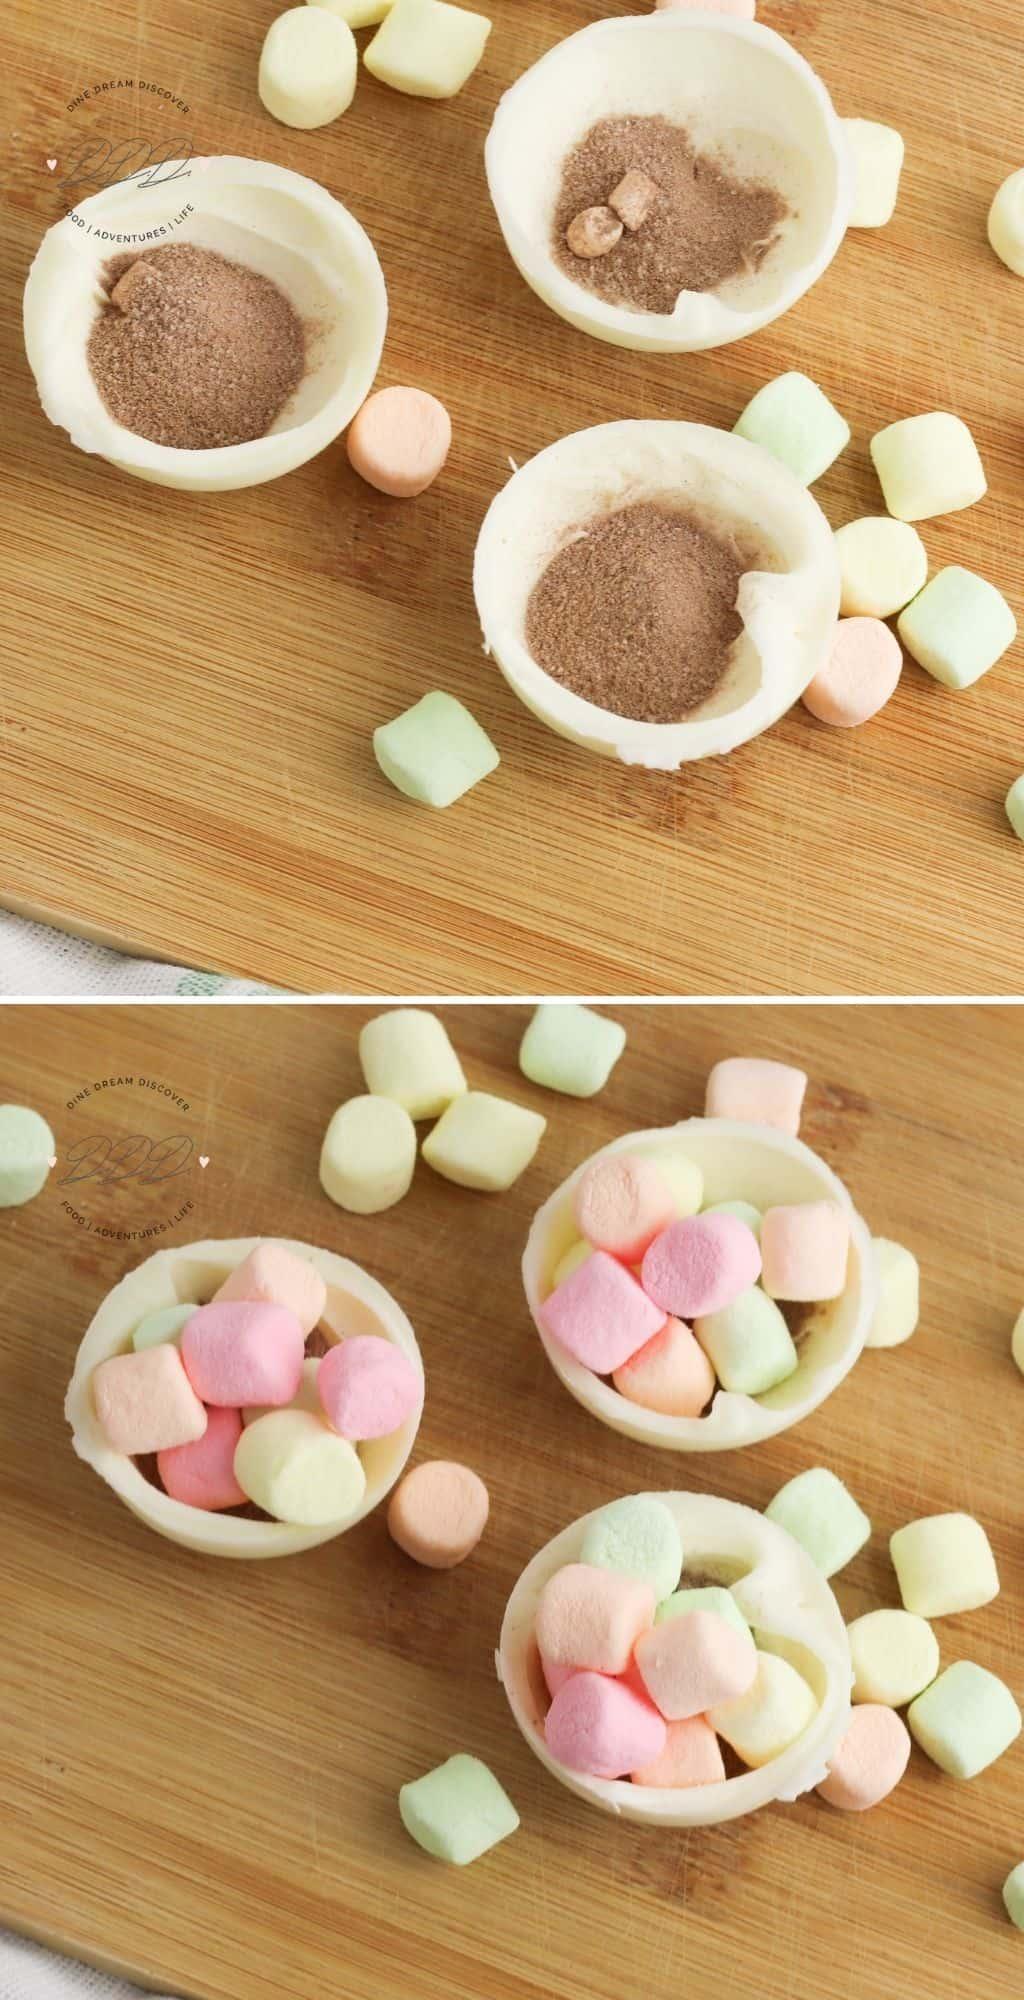 Rainbow Sprinkles White Hot Chocolate Bombs